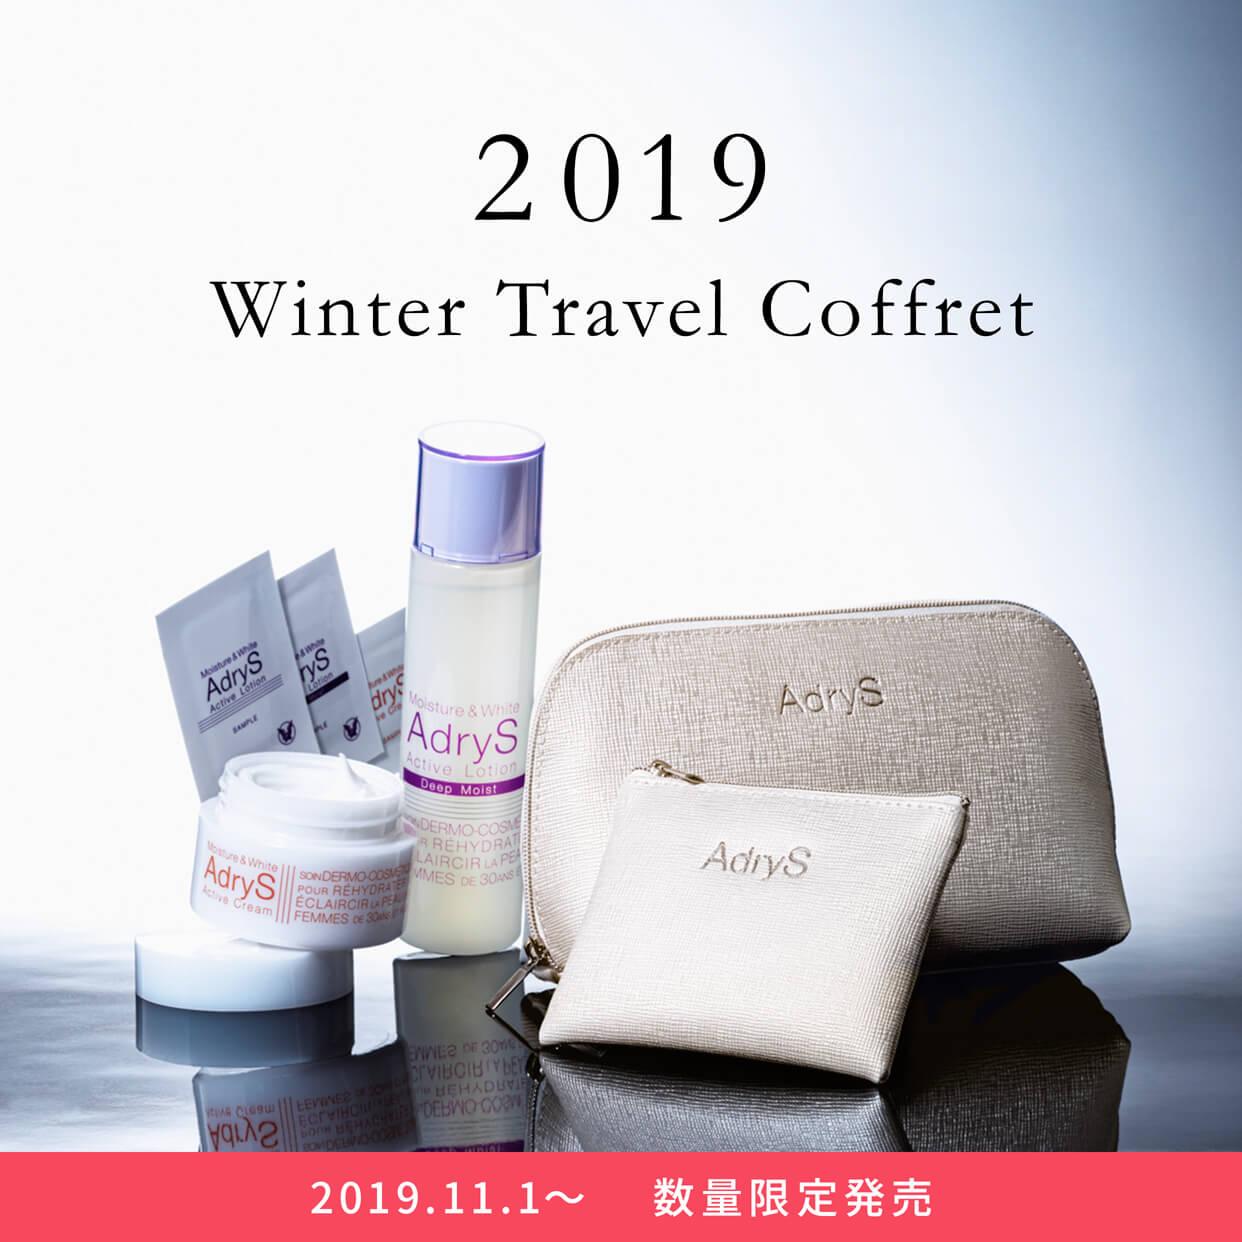 2019 Winter Travel Coffret